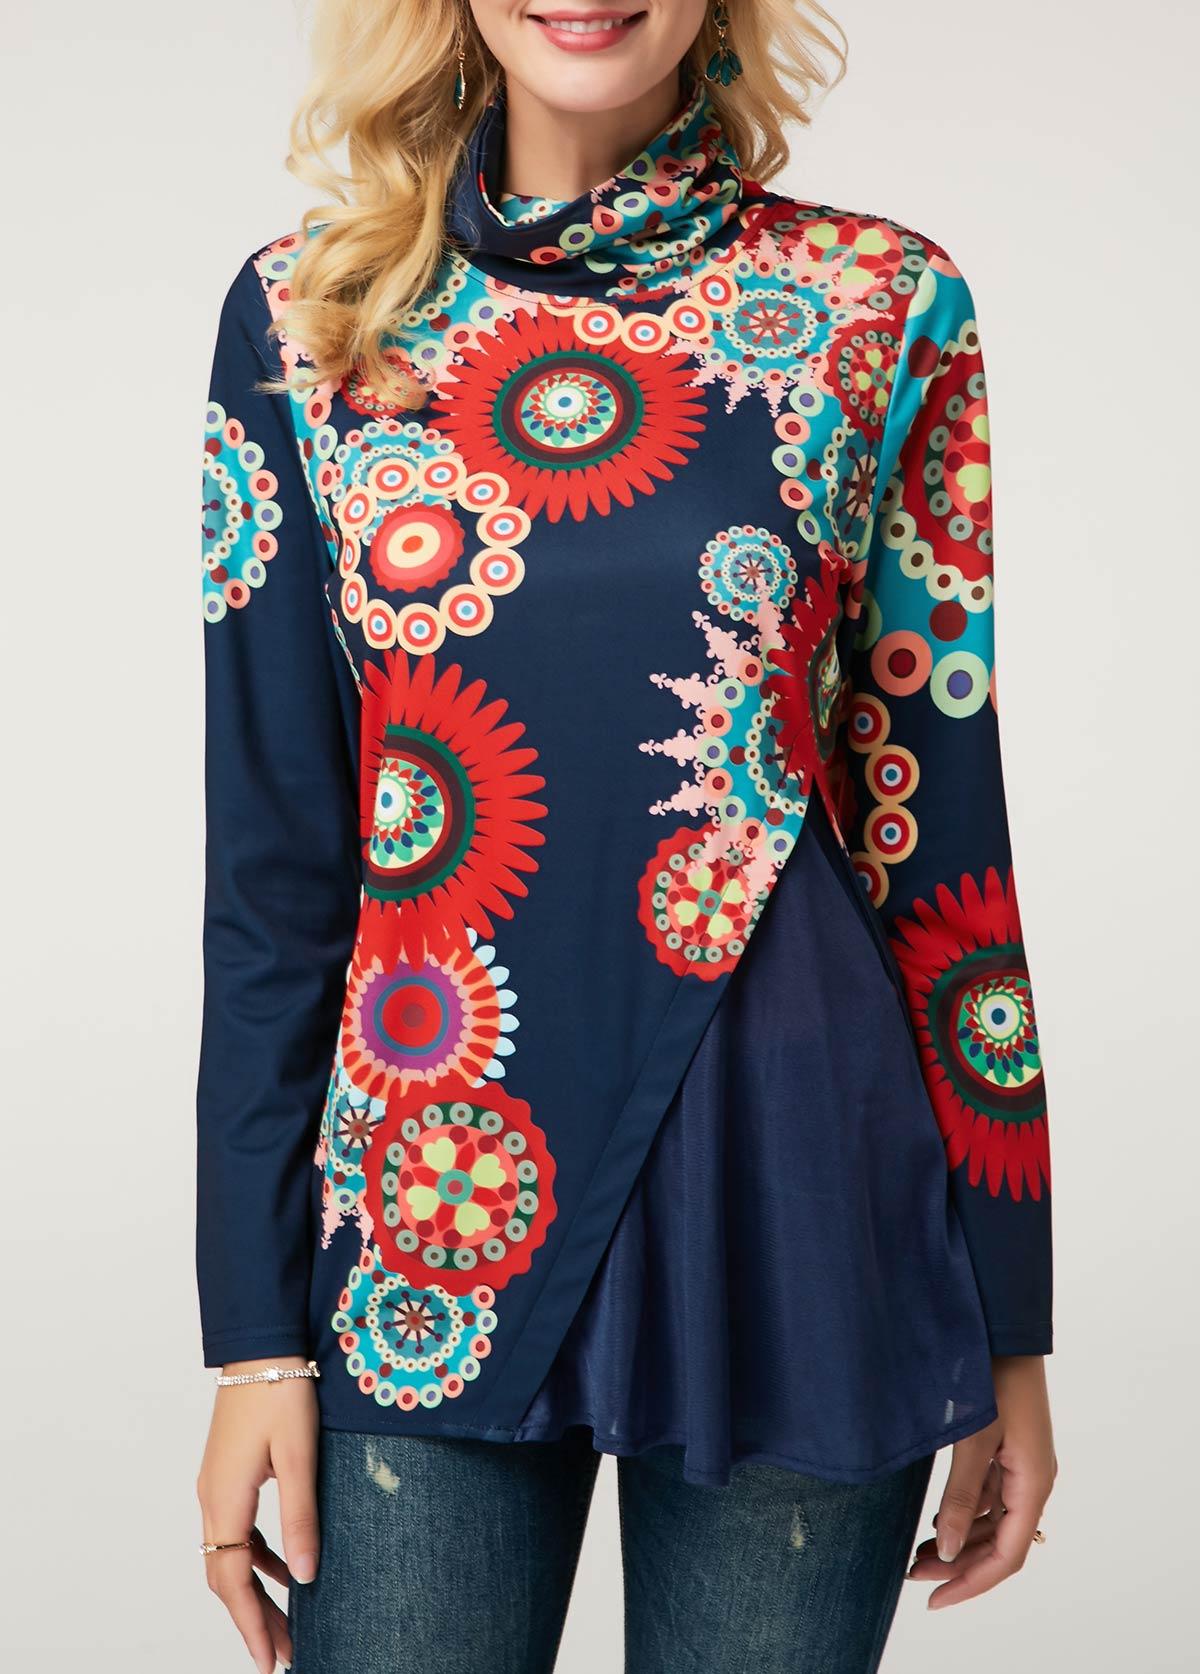 ROTITA Printed Long Sleeve Navy Blue Blouse